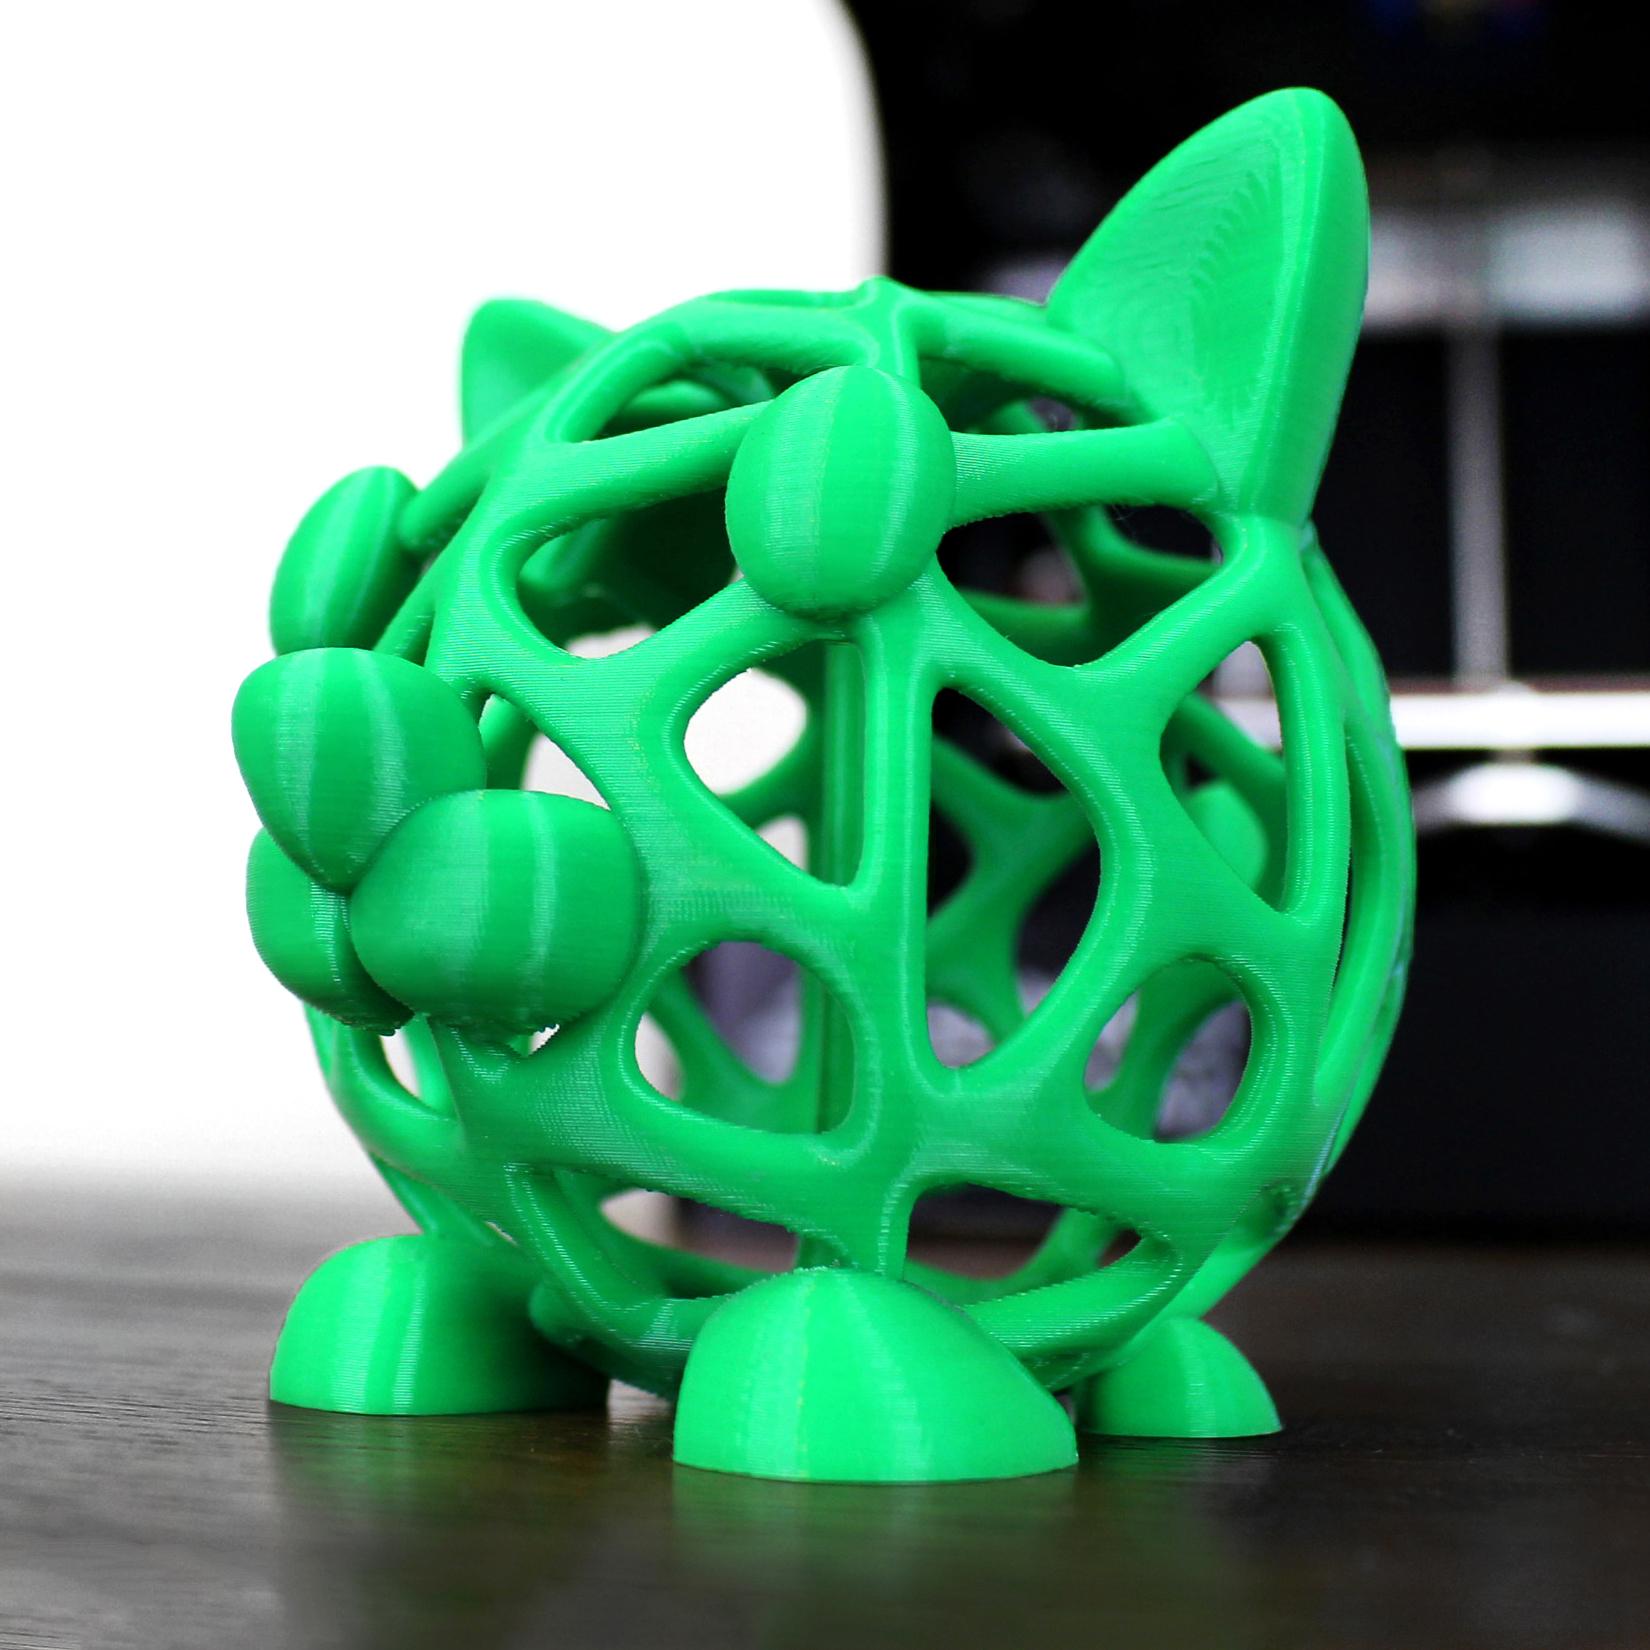 Lepton2 3Dプリンター  ヒーテッドベッド(HBP) 標準搭載 - 画像5